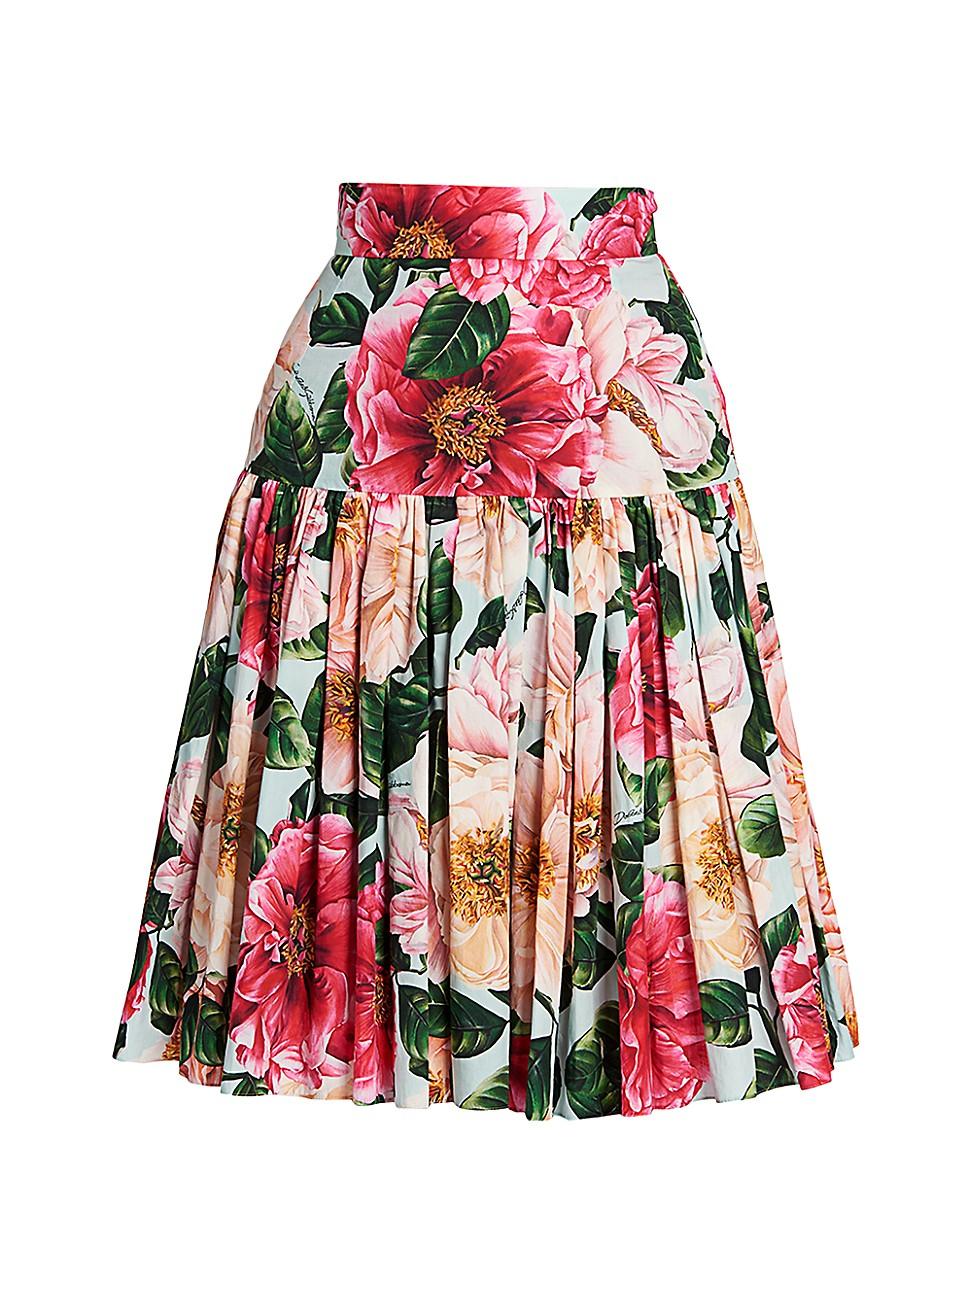 Dolce & Gabbana WOMEN'S FLORAL POPLIN PLEATED SKIRT